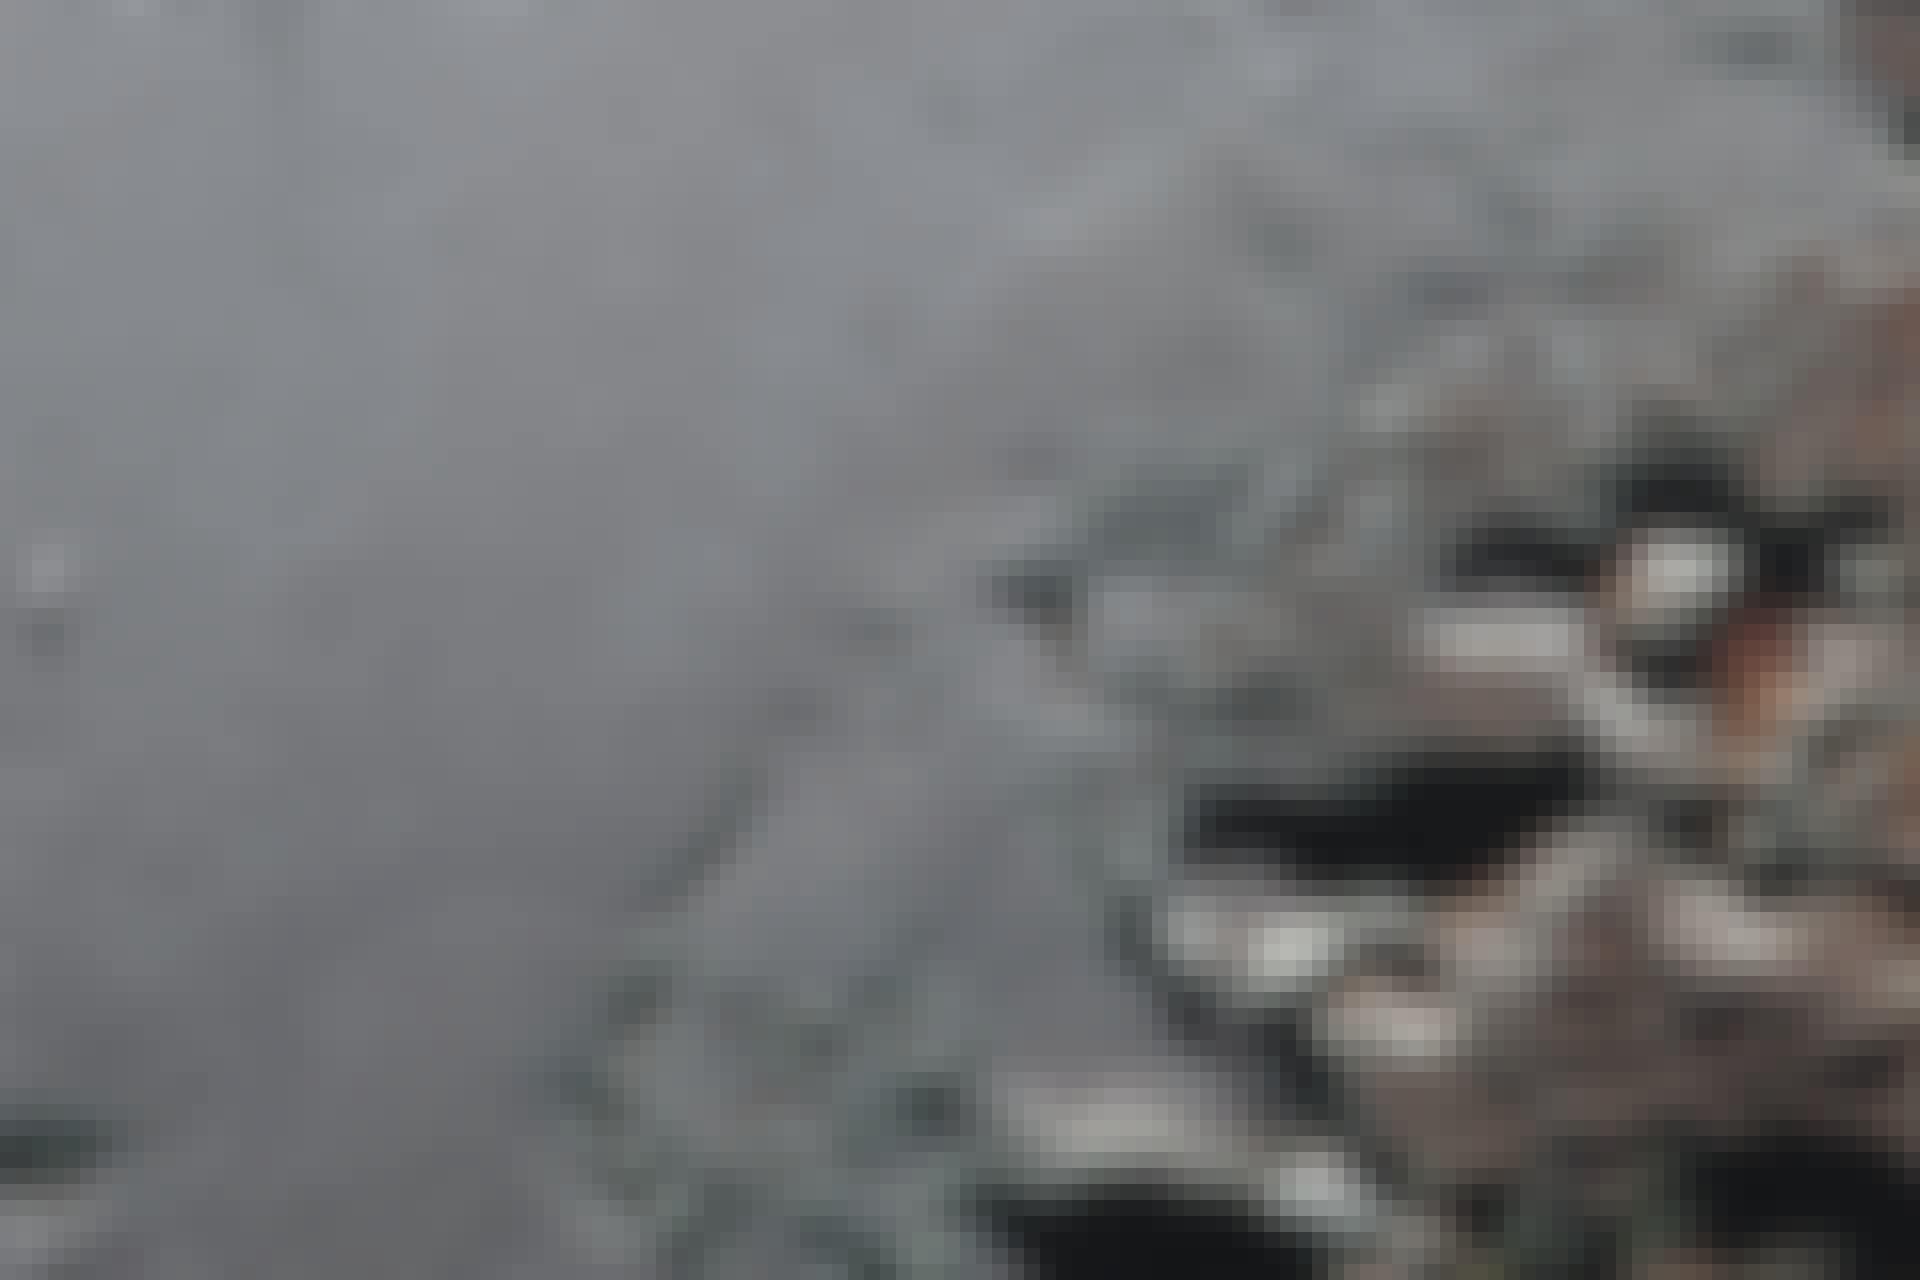 Pluto, Krun Macula